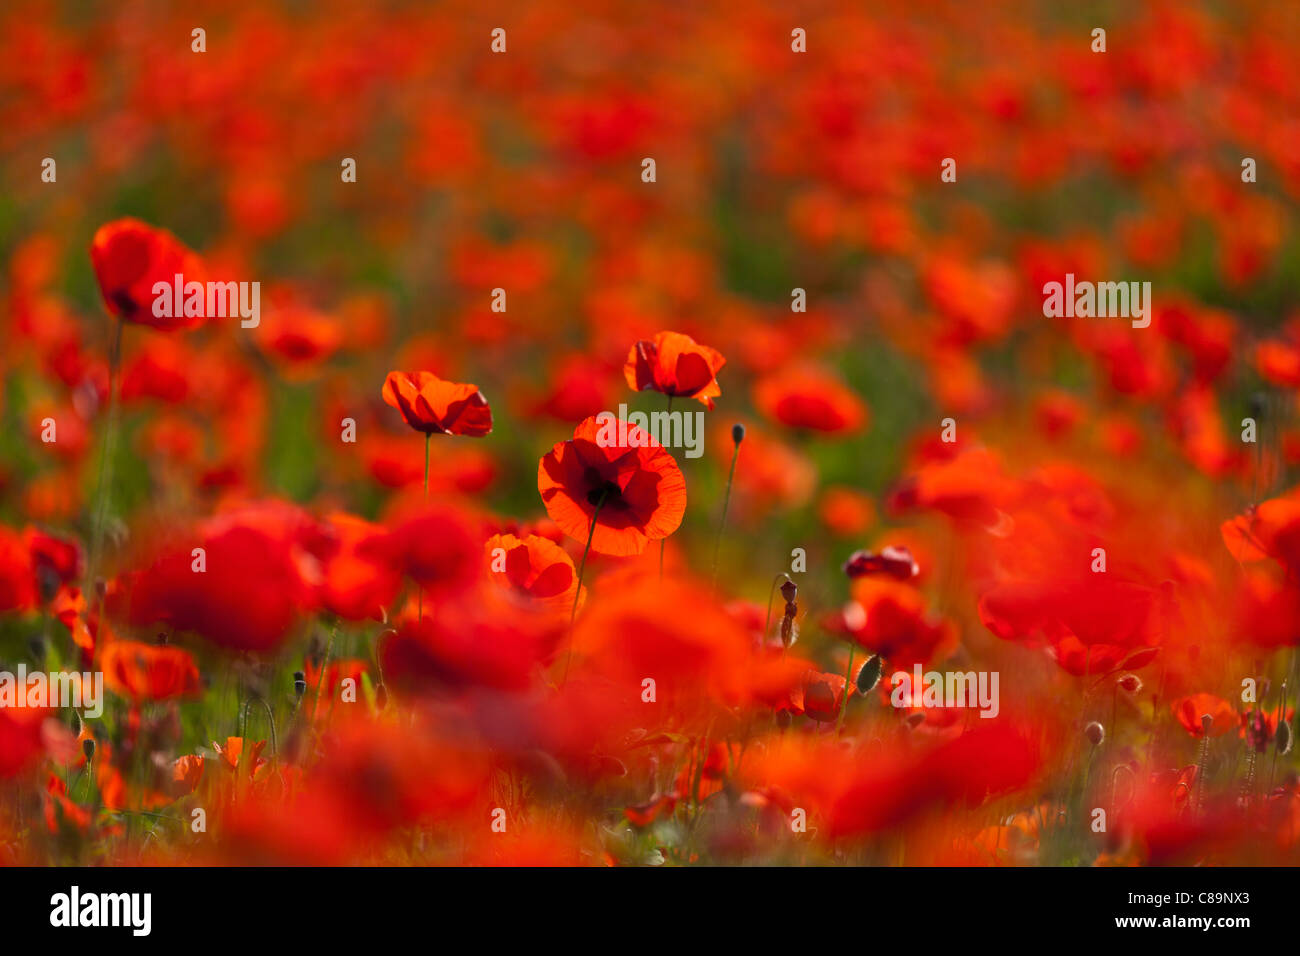 Italia, Toscana, Creta, Vista de campo de amapolas rojas Imagen De Stock